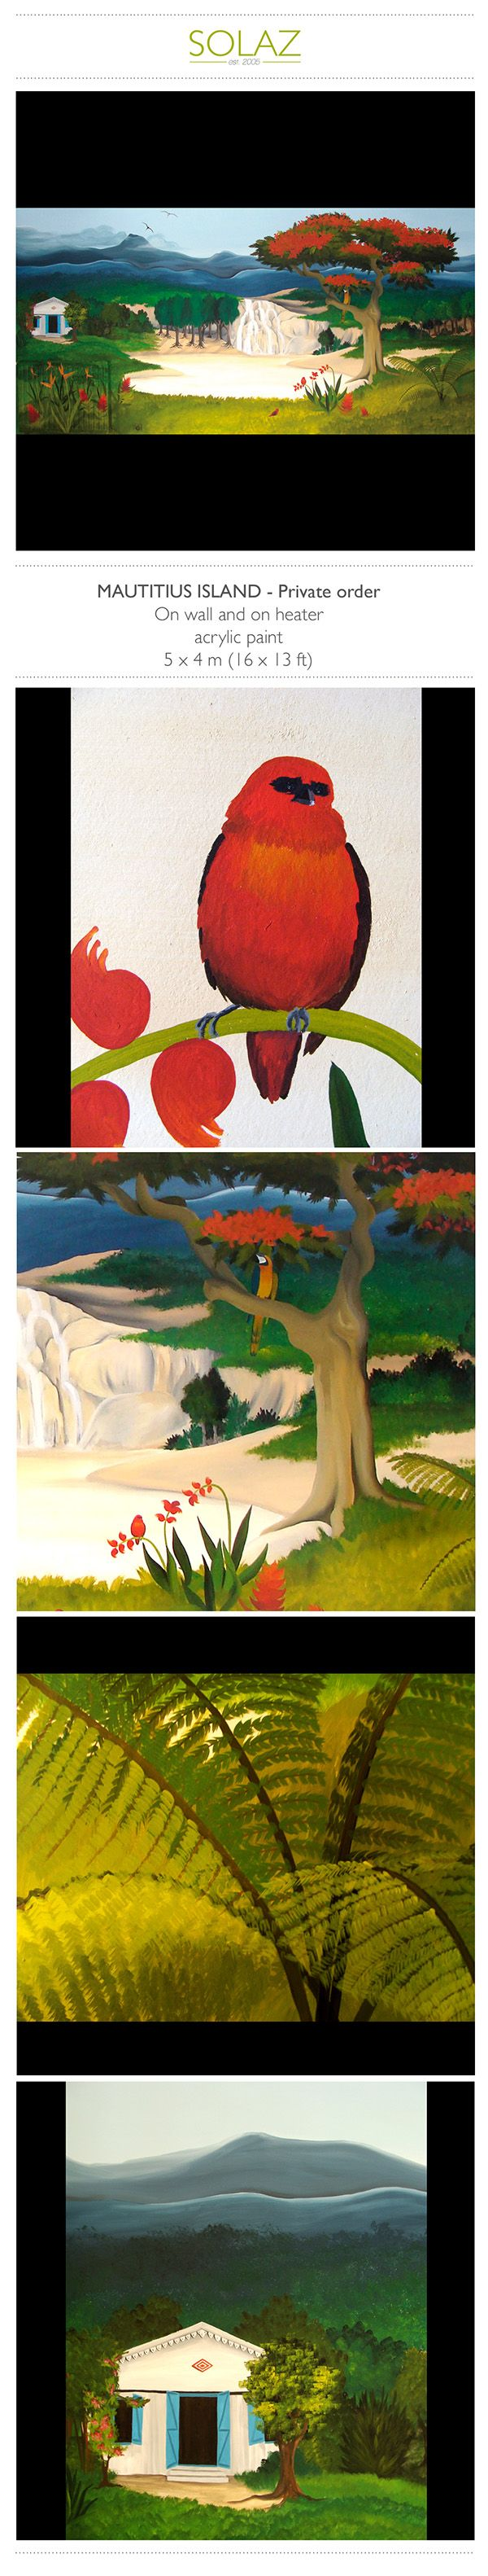 MAUTITIUS ISLAND - Private order by Helene Bataille, via Behance -  www.designbysolaz.com #drawing #illustration #painting #paint #mural #wallpainting #mauritius #island #paradise #landscape #mountains #artisanal #handwork #livingroom